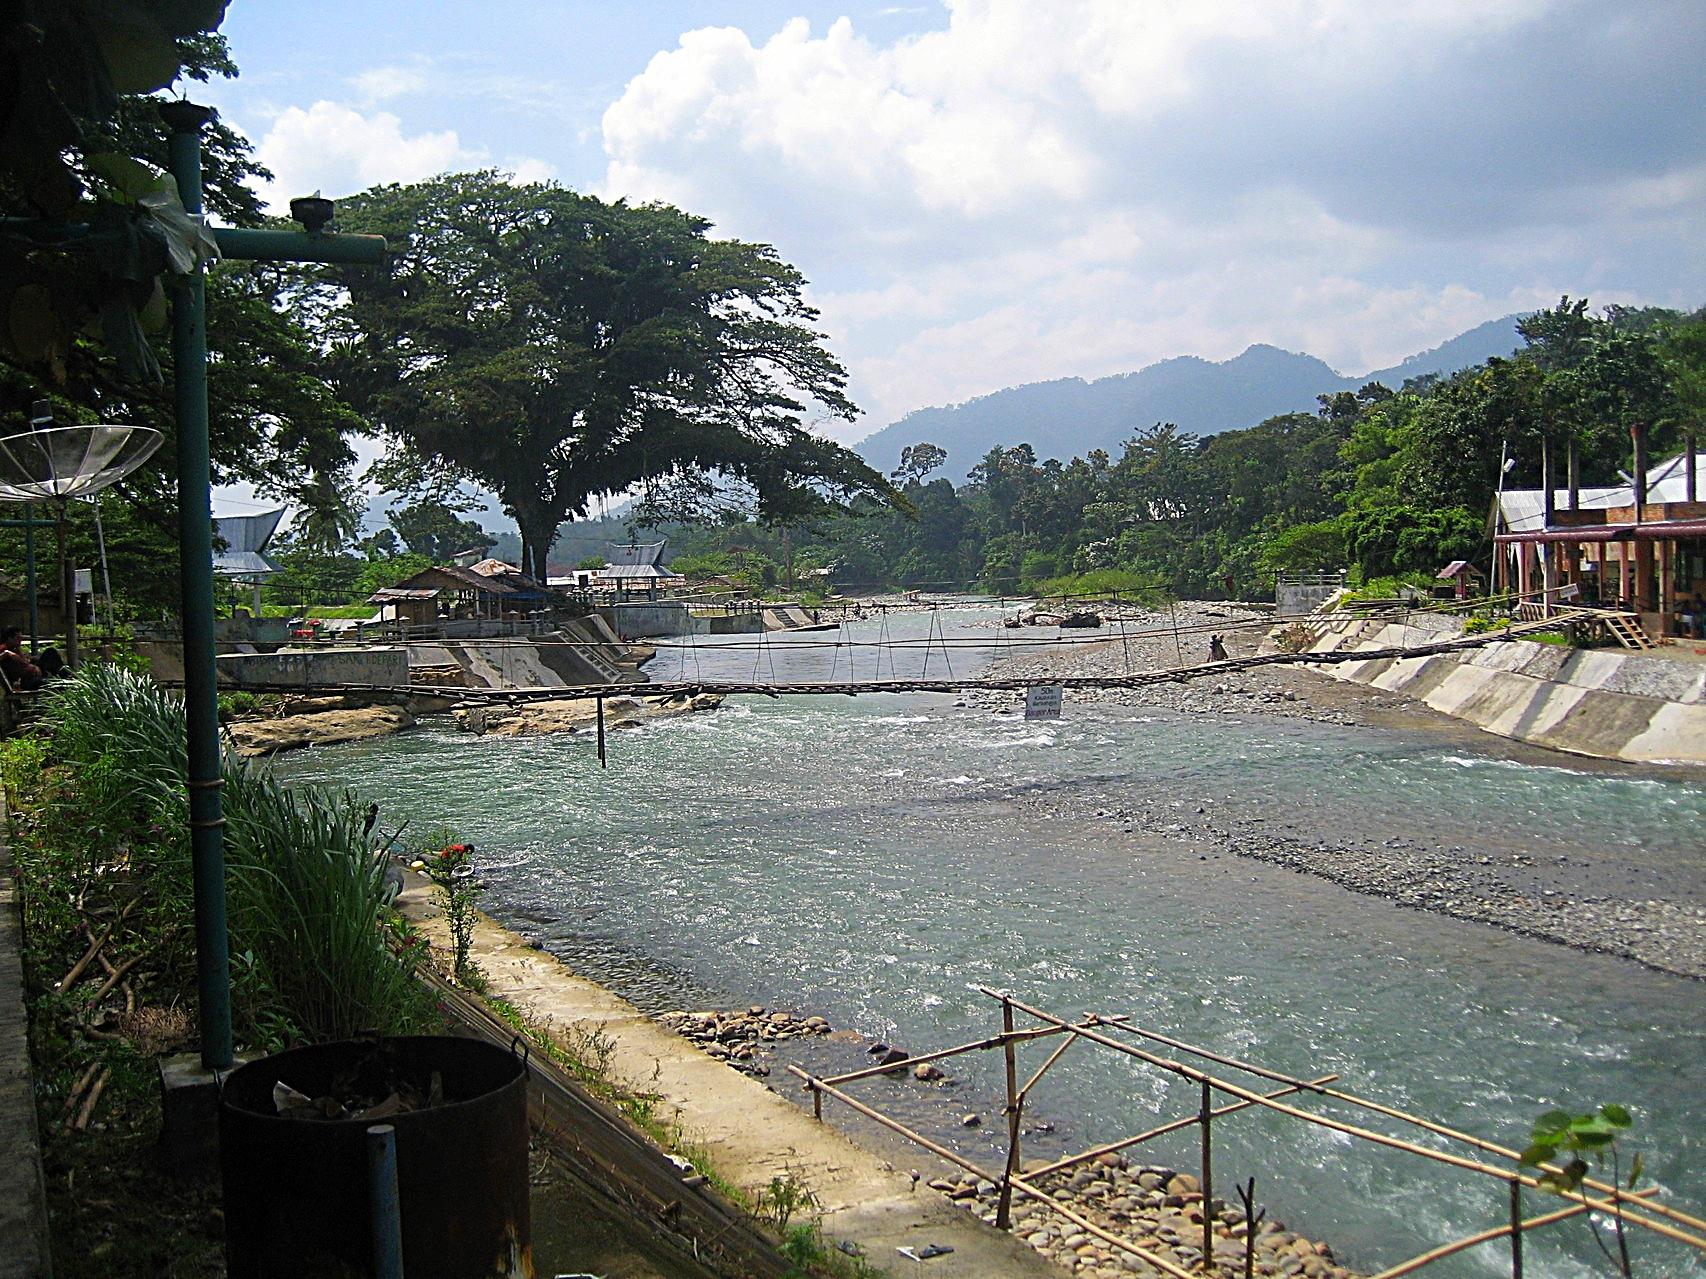 Bohorok River in Bukit Lawang